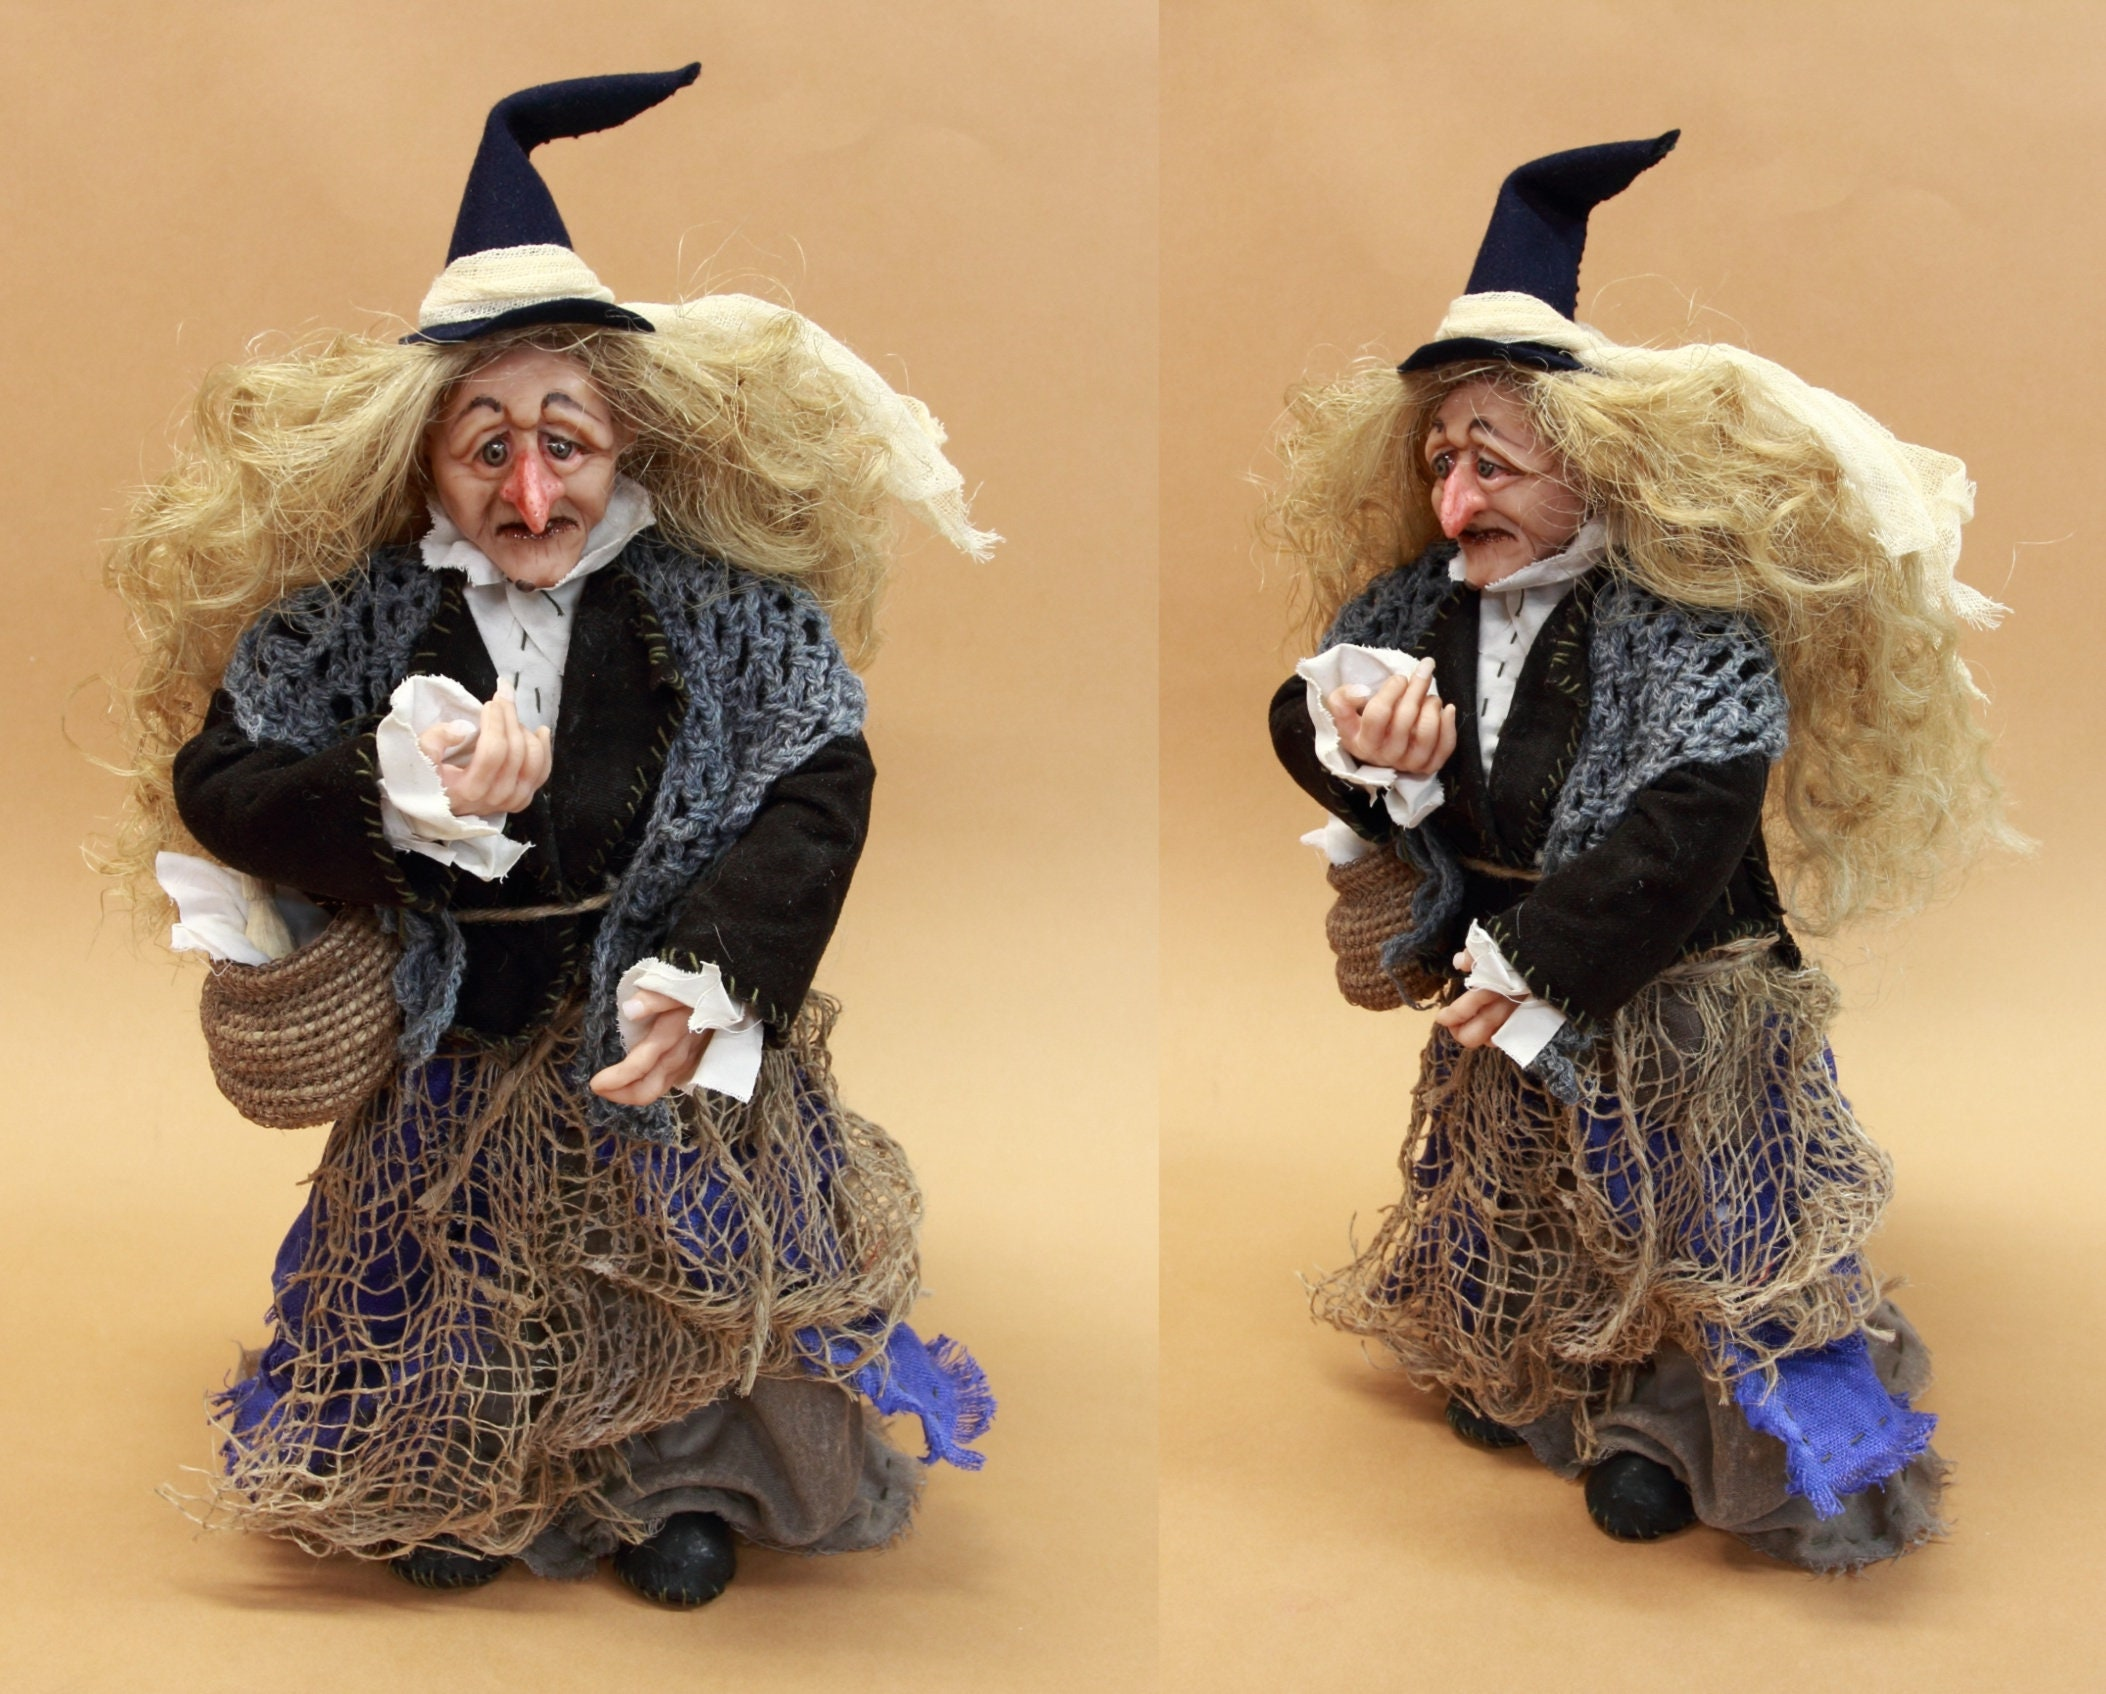 Hexe OOAK Puppe handgemacht alte Frau Figur sammelbare